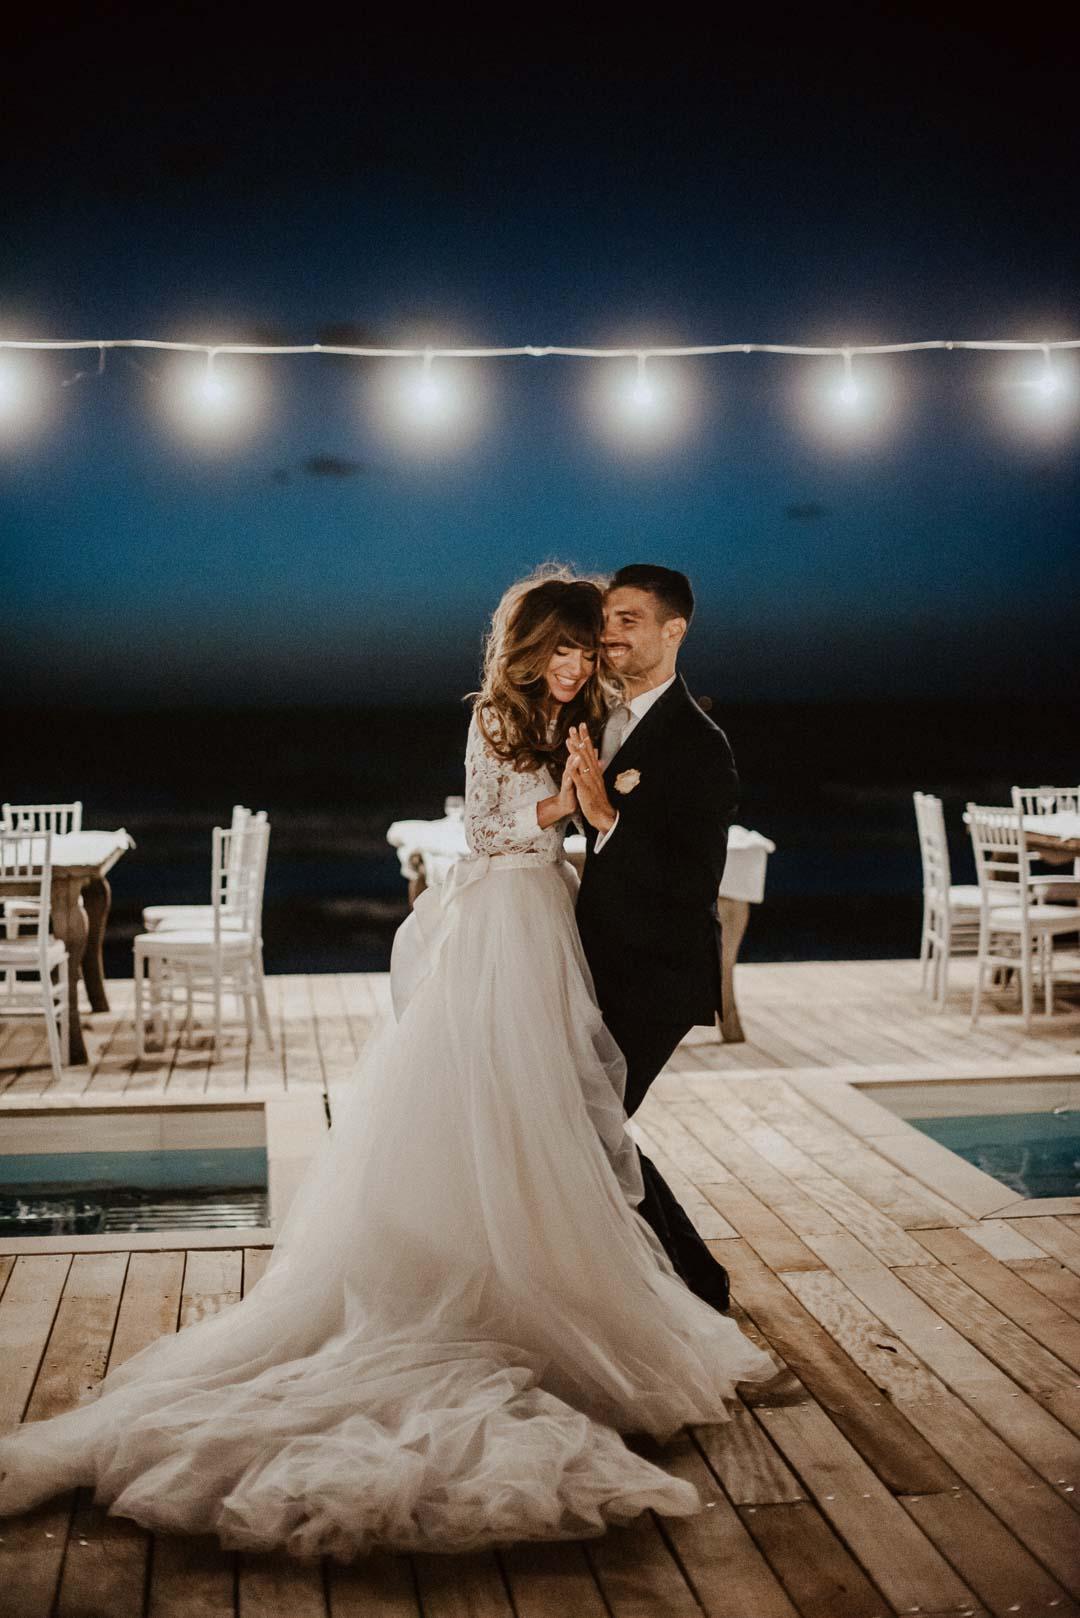 wedding-photographer-destination-fineart-bespoke-reportage-napoli-nabilah-vivianeizzo-spazio46-159